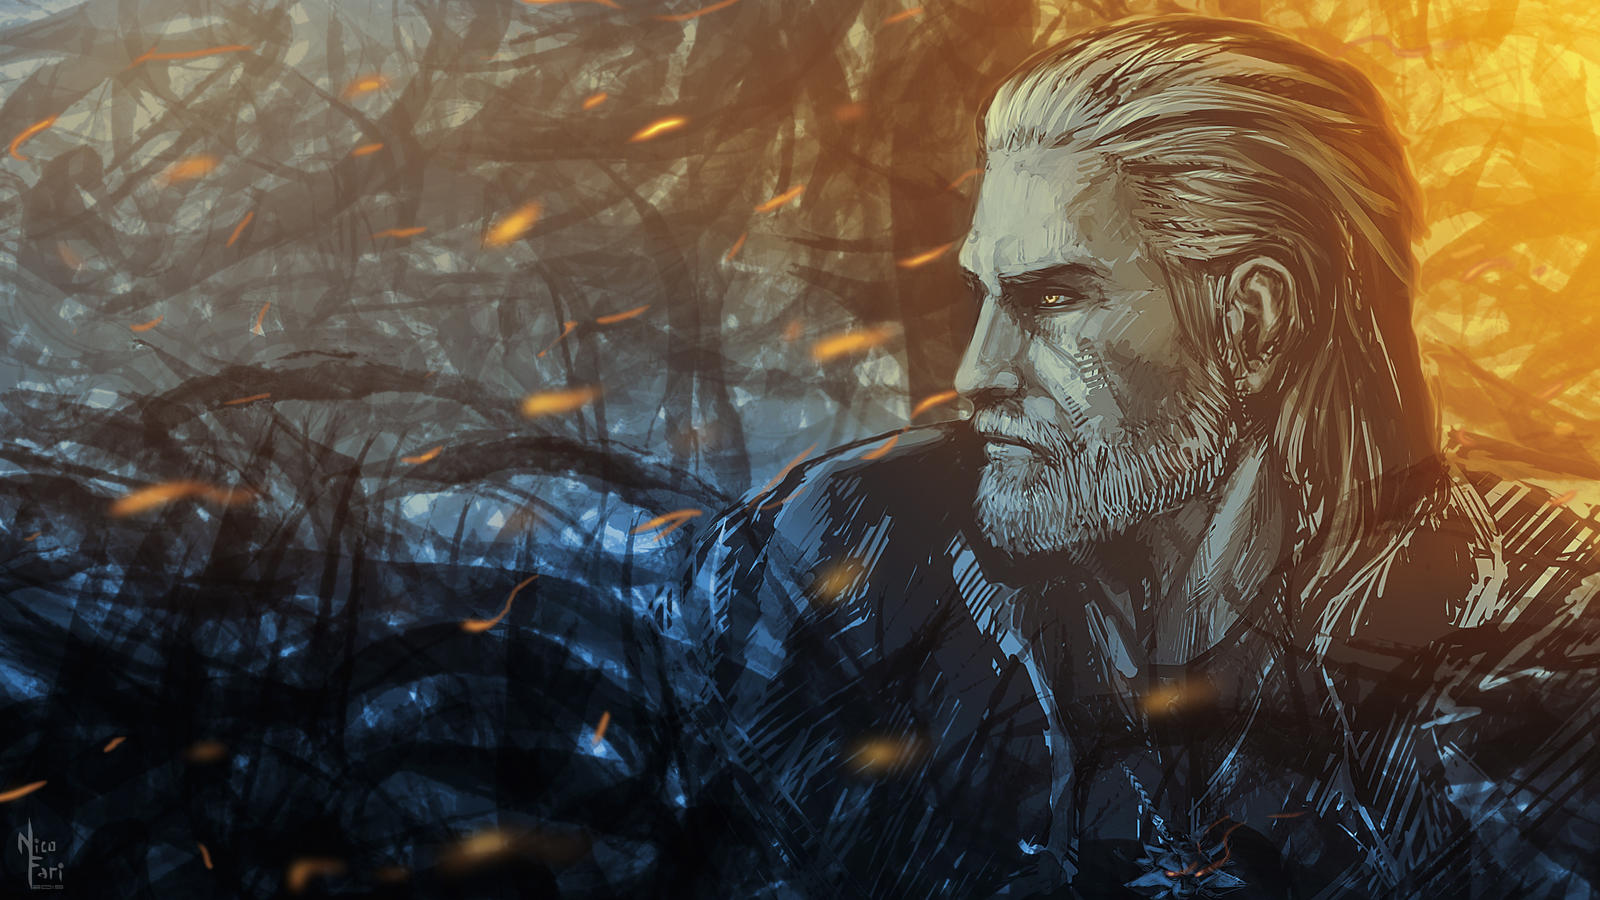 ✮ SPIRIT BRINGERS: THE SIDER STORIES (ANTES LABERINTO DE LA DEMENCIA ☠) - Página 5 Geralt_of_rivia_by_nicofari-d9560kt